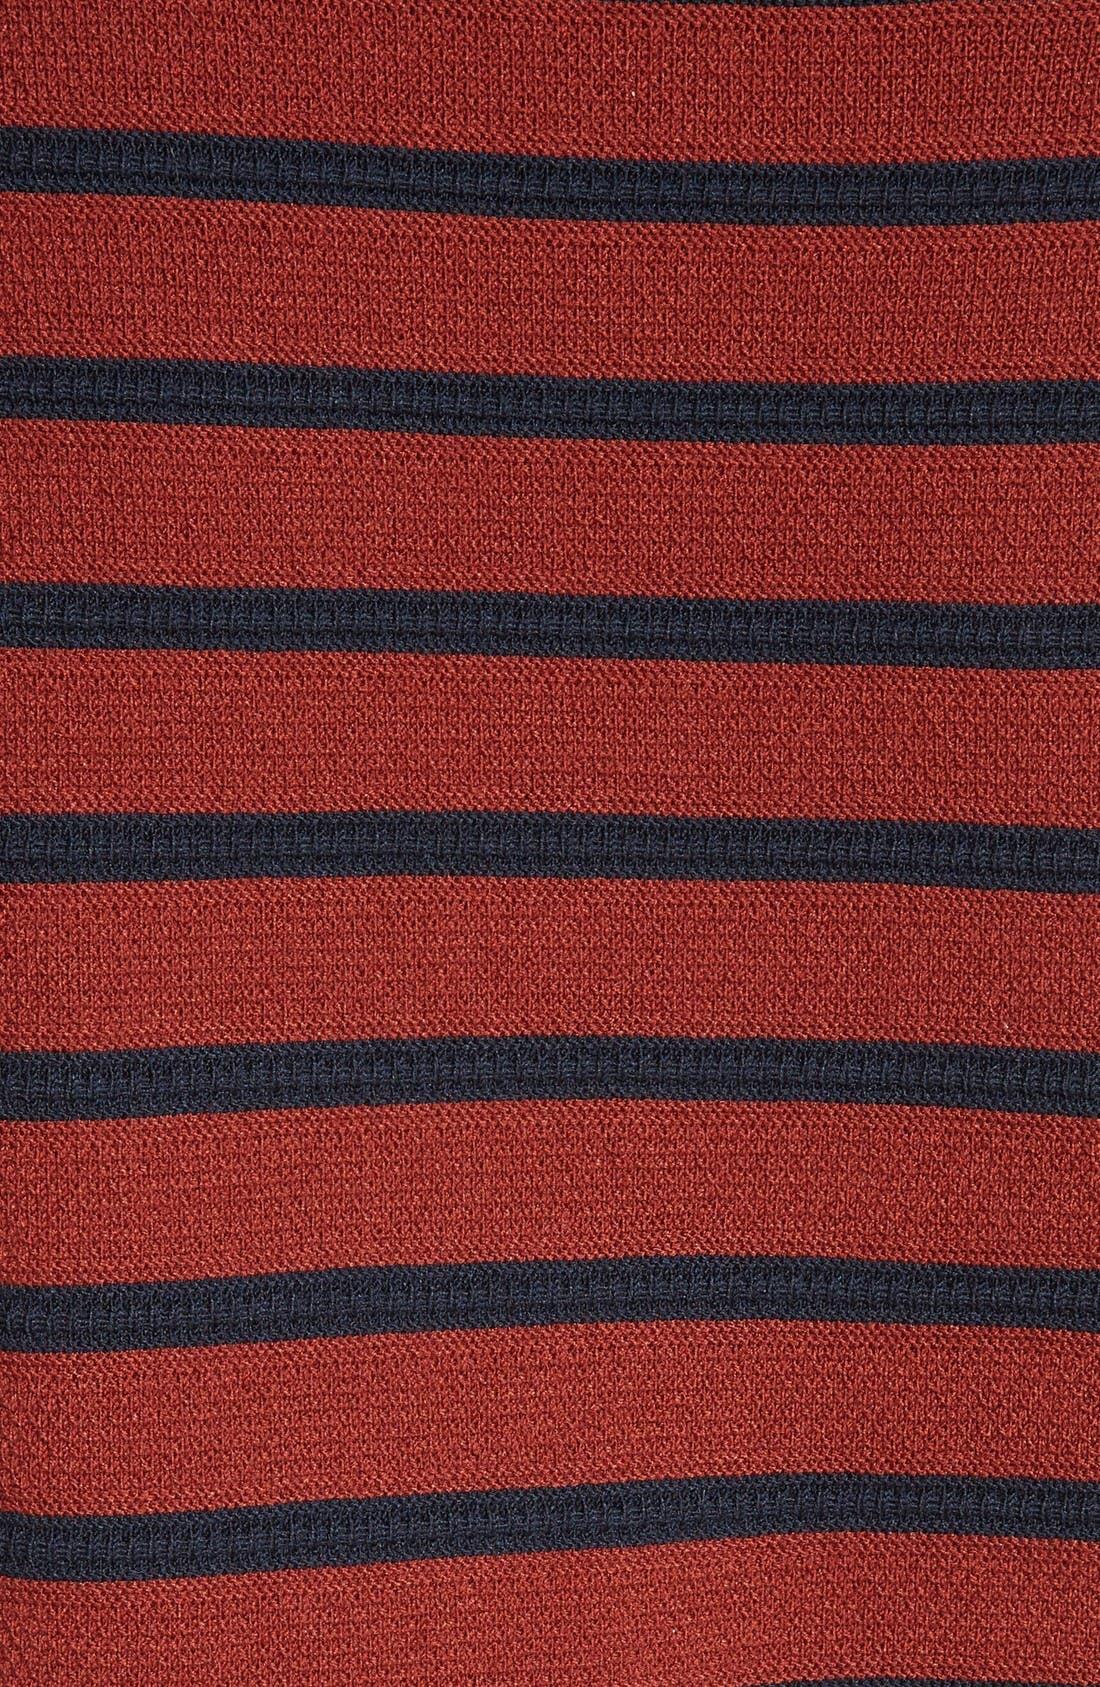 Alternate Image 5  - Theory Lemdora Prosecco Sweater